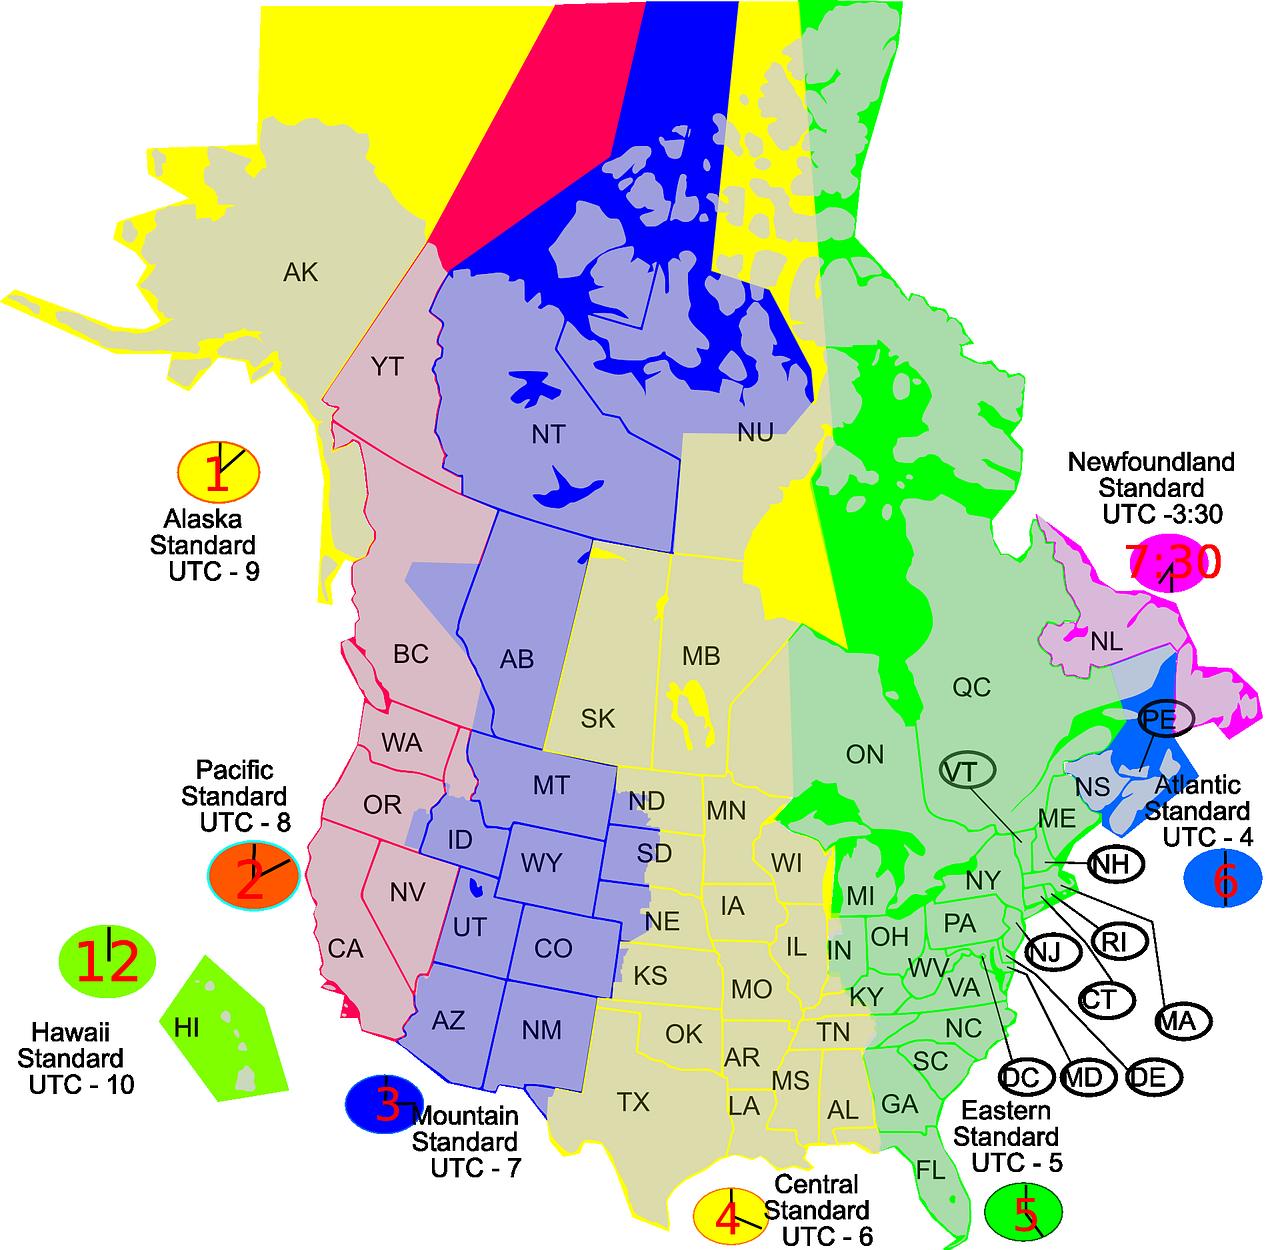 Timezone,time,zone,map,united states - free photo from needpix.com